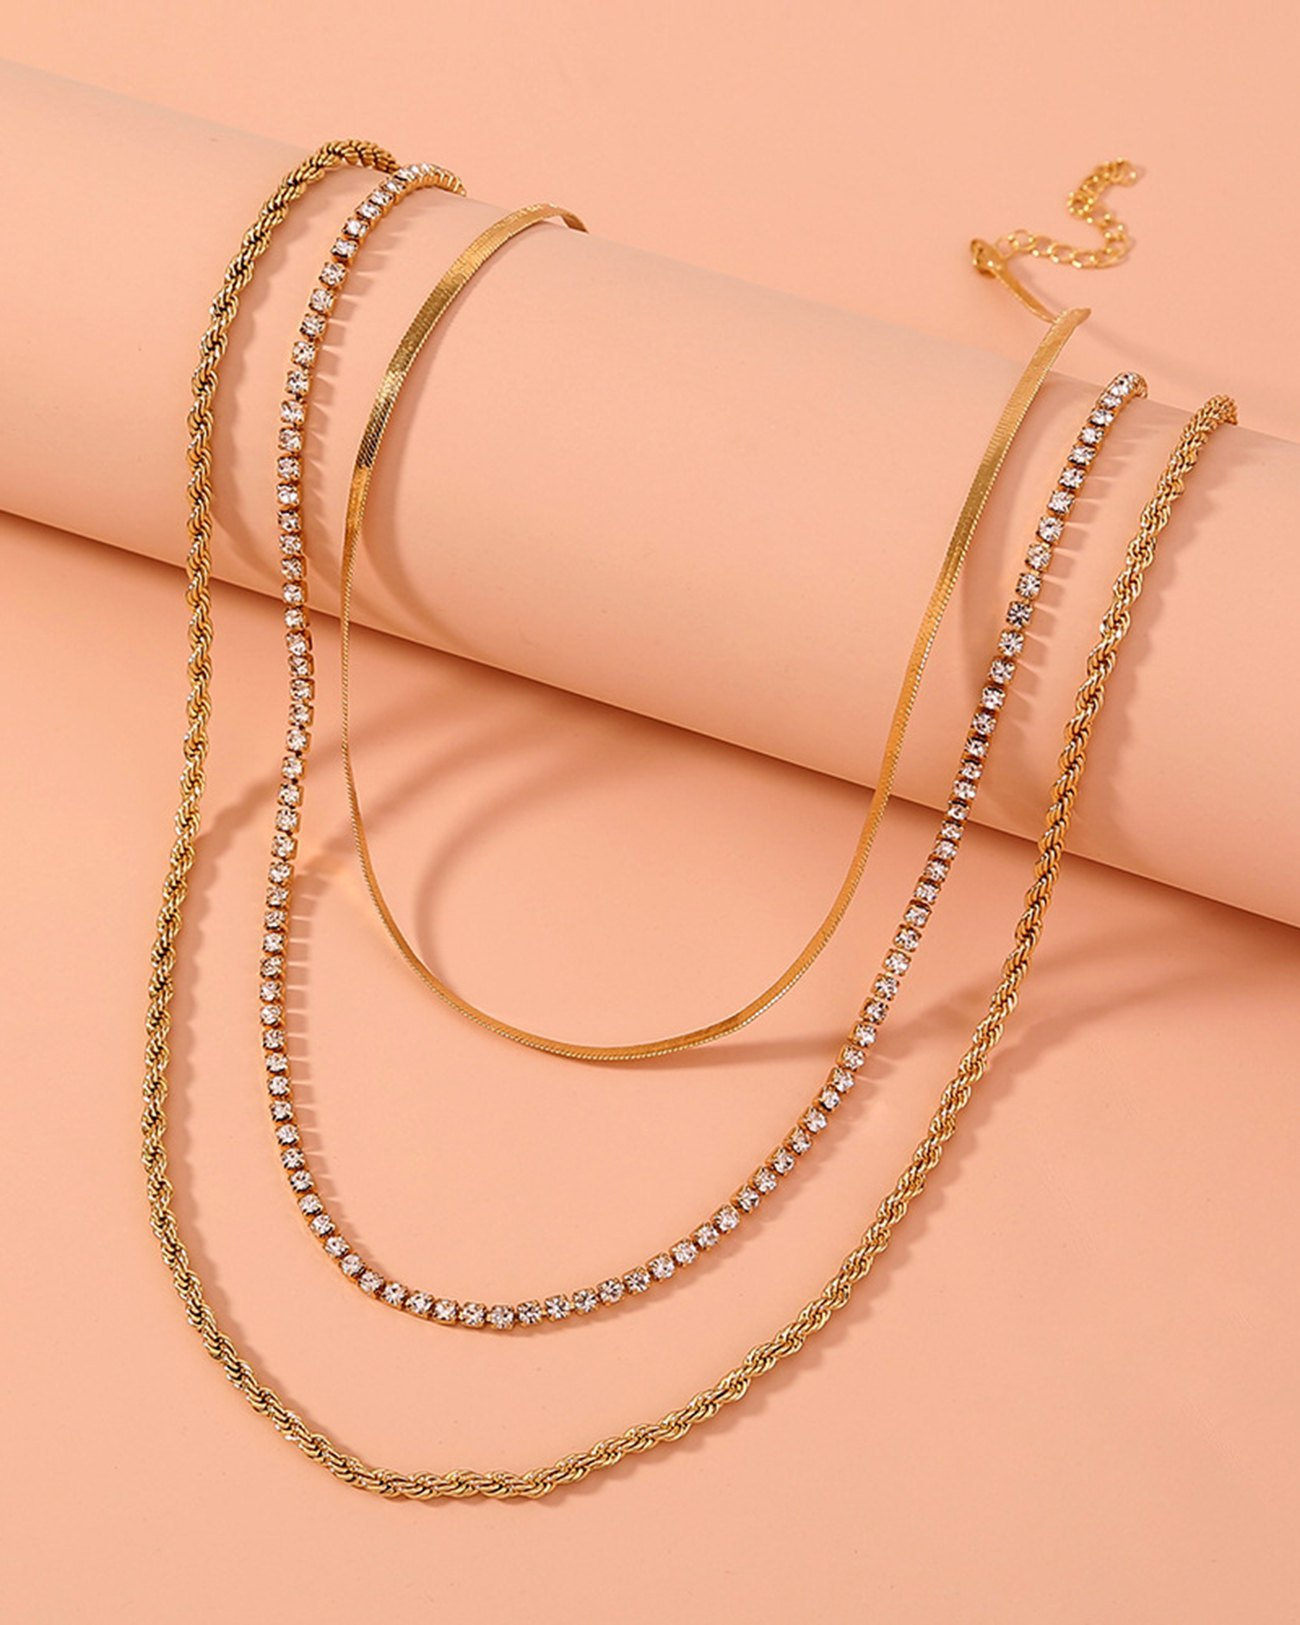 Zircon Necklace Sets - Golden ONE SIZE